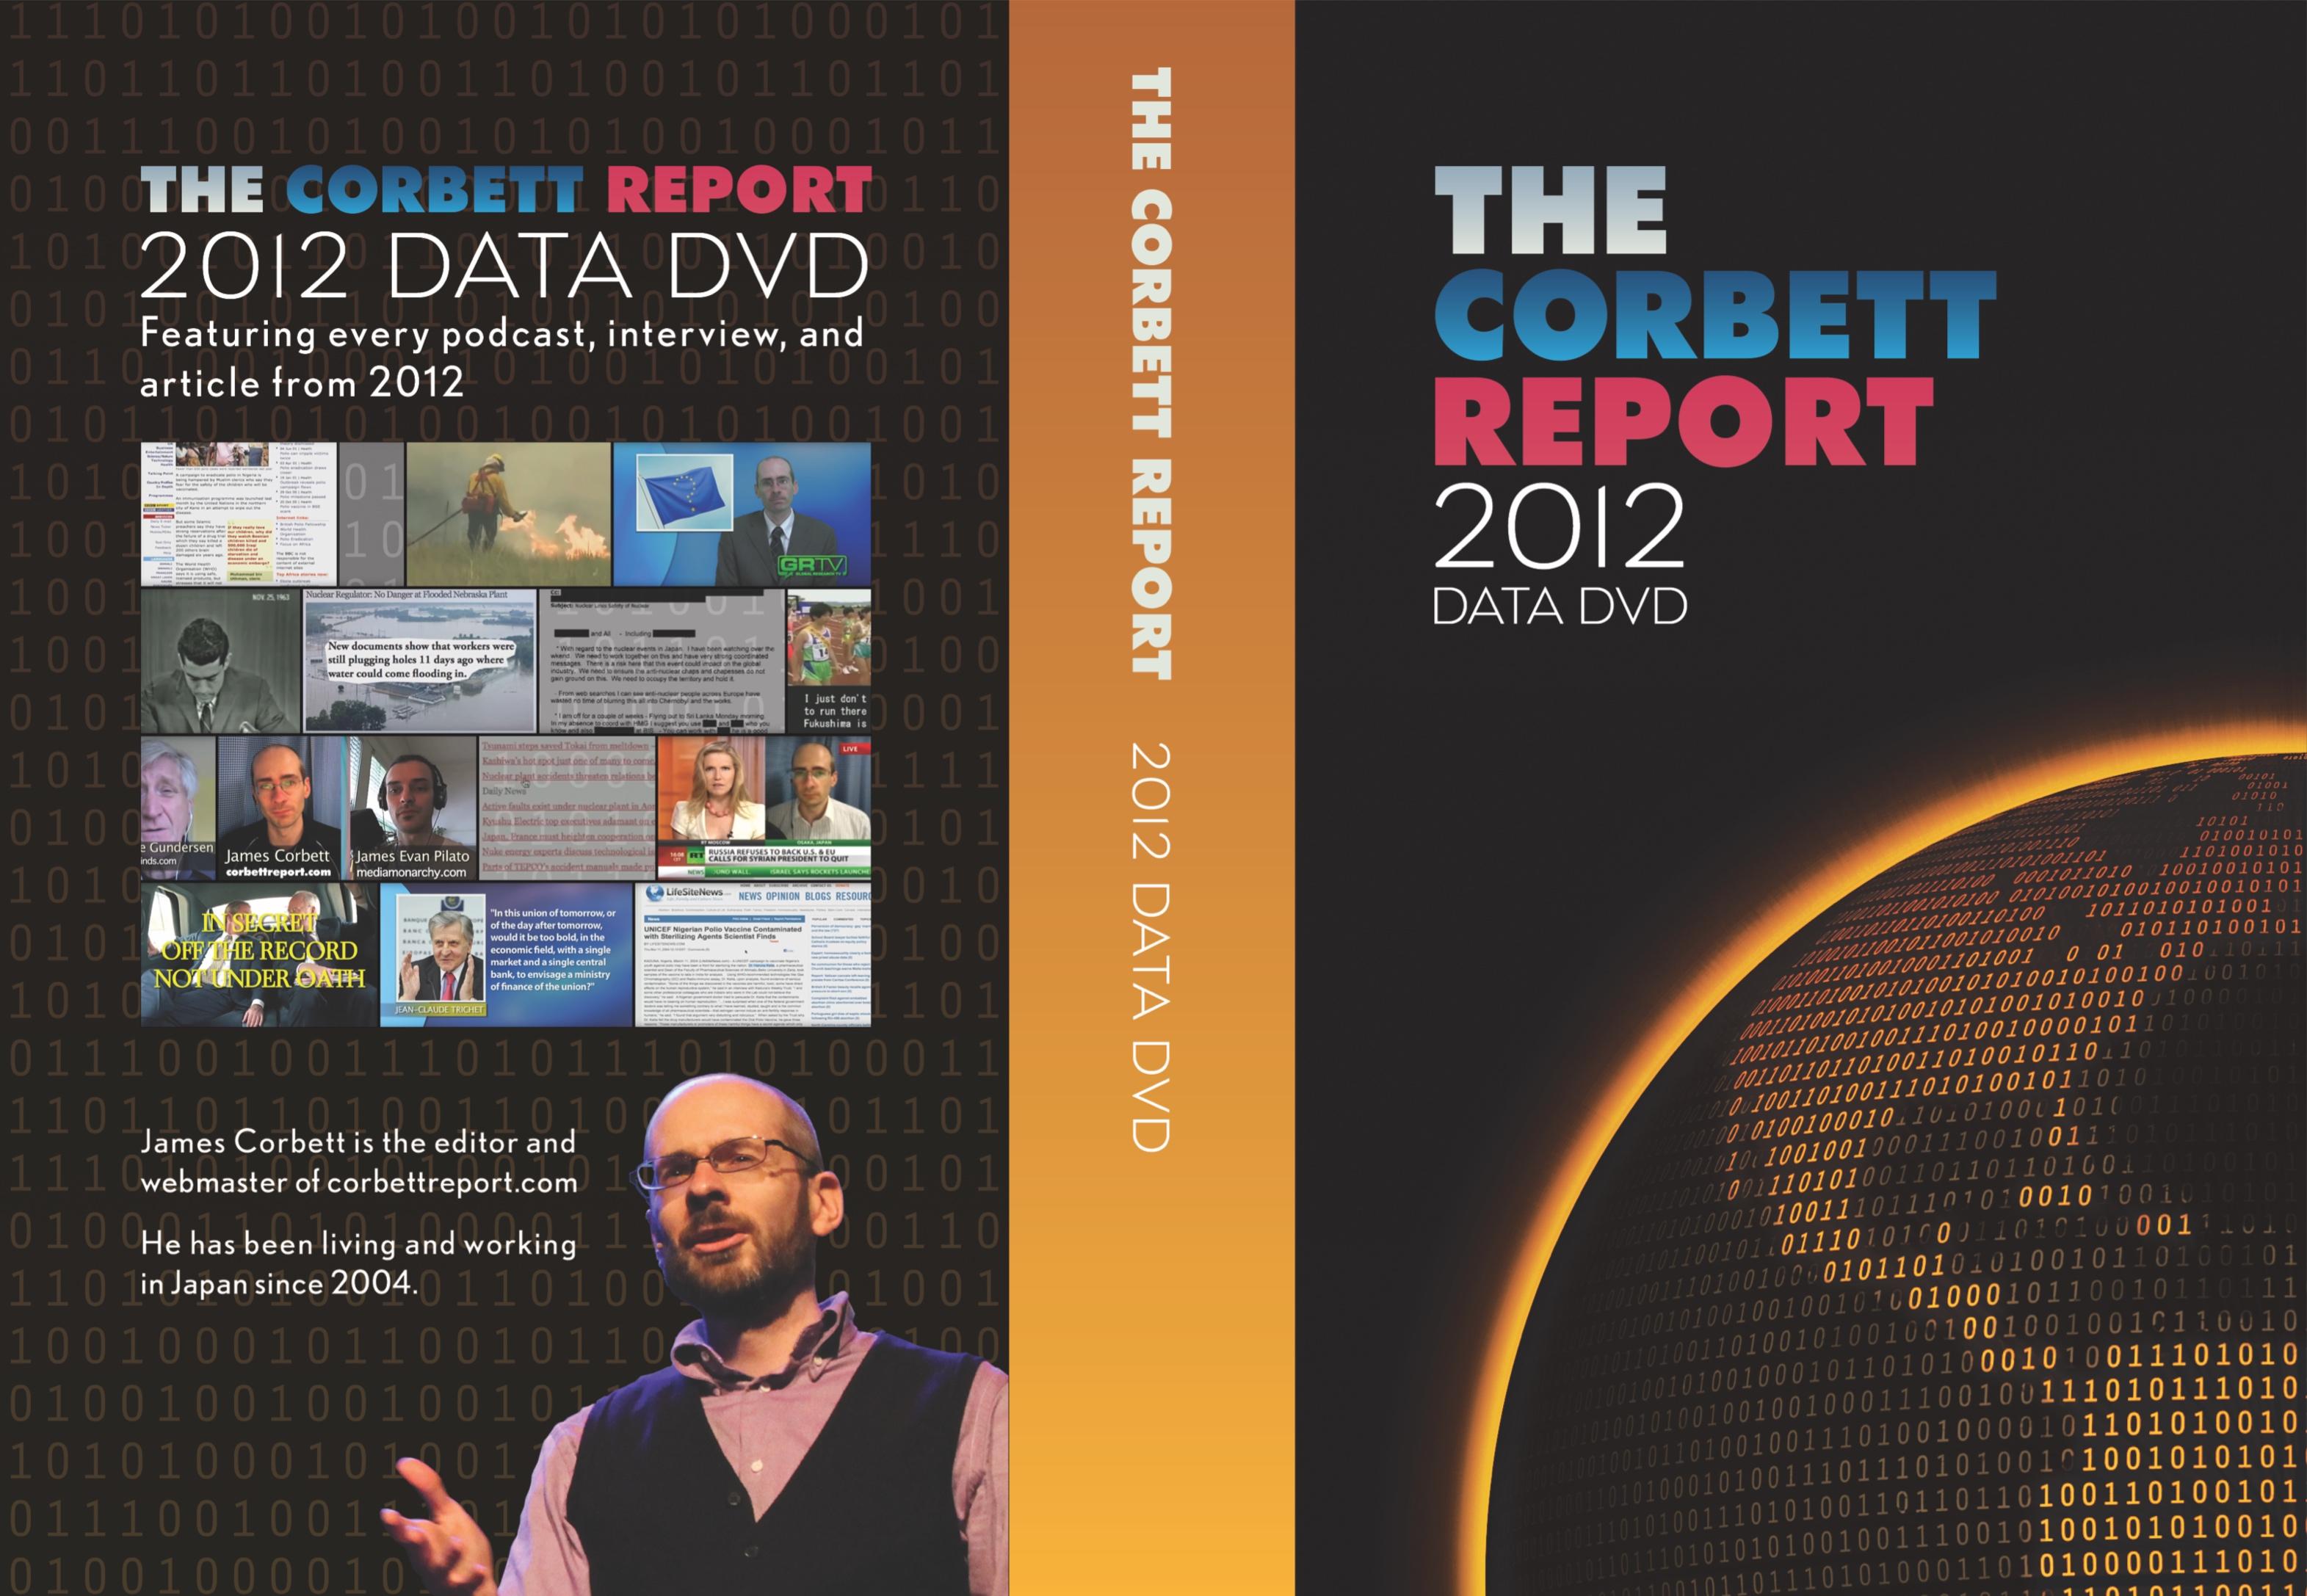 Data DVD 2012